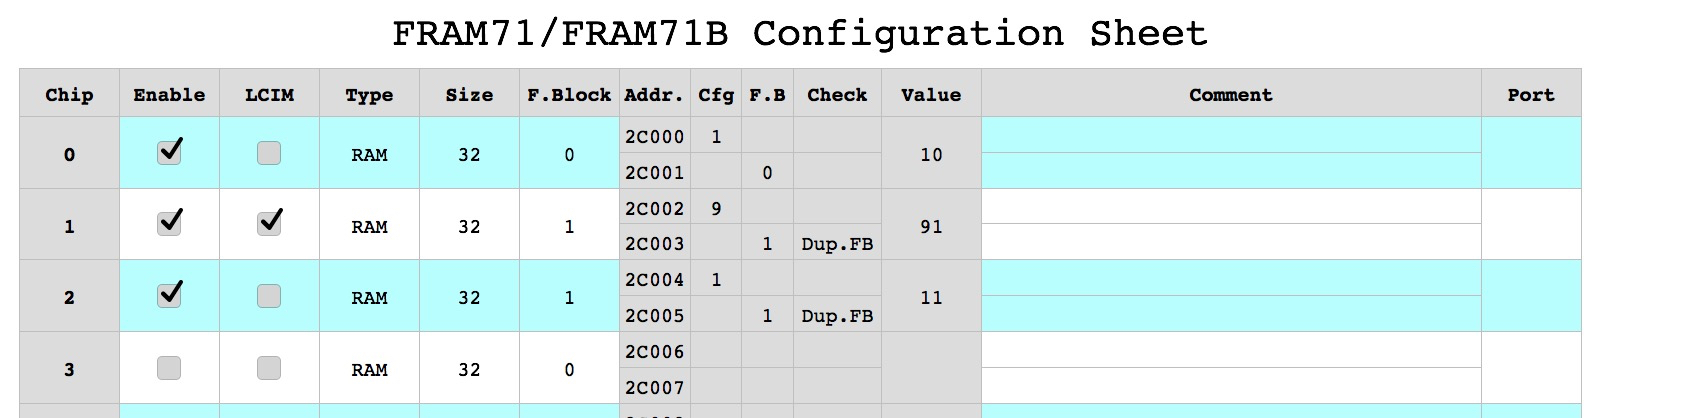 [Image: FRAM71B_Configurator_20210131B_validation.jpg]